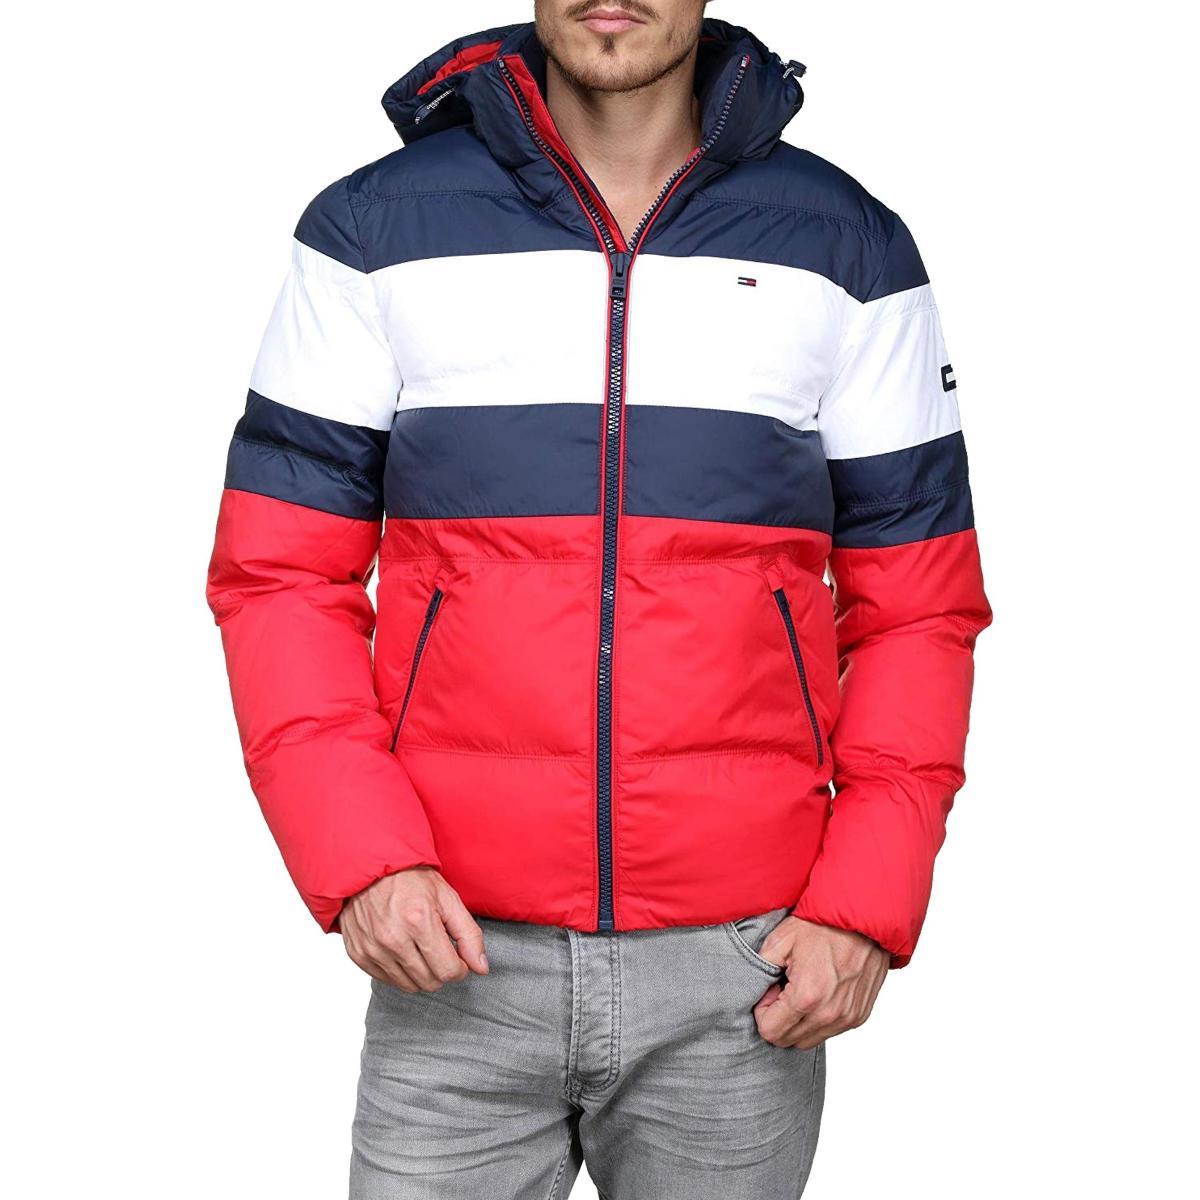 Giubbotto giacca rugby Tommy Jeans da uomo rif.DM0DM05024